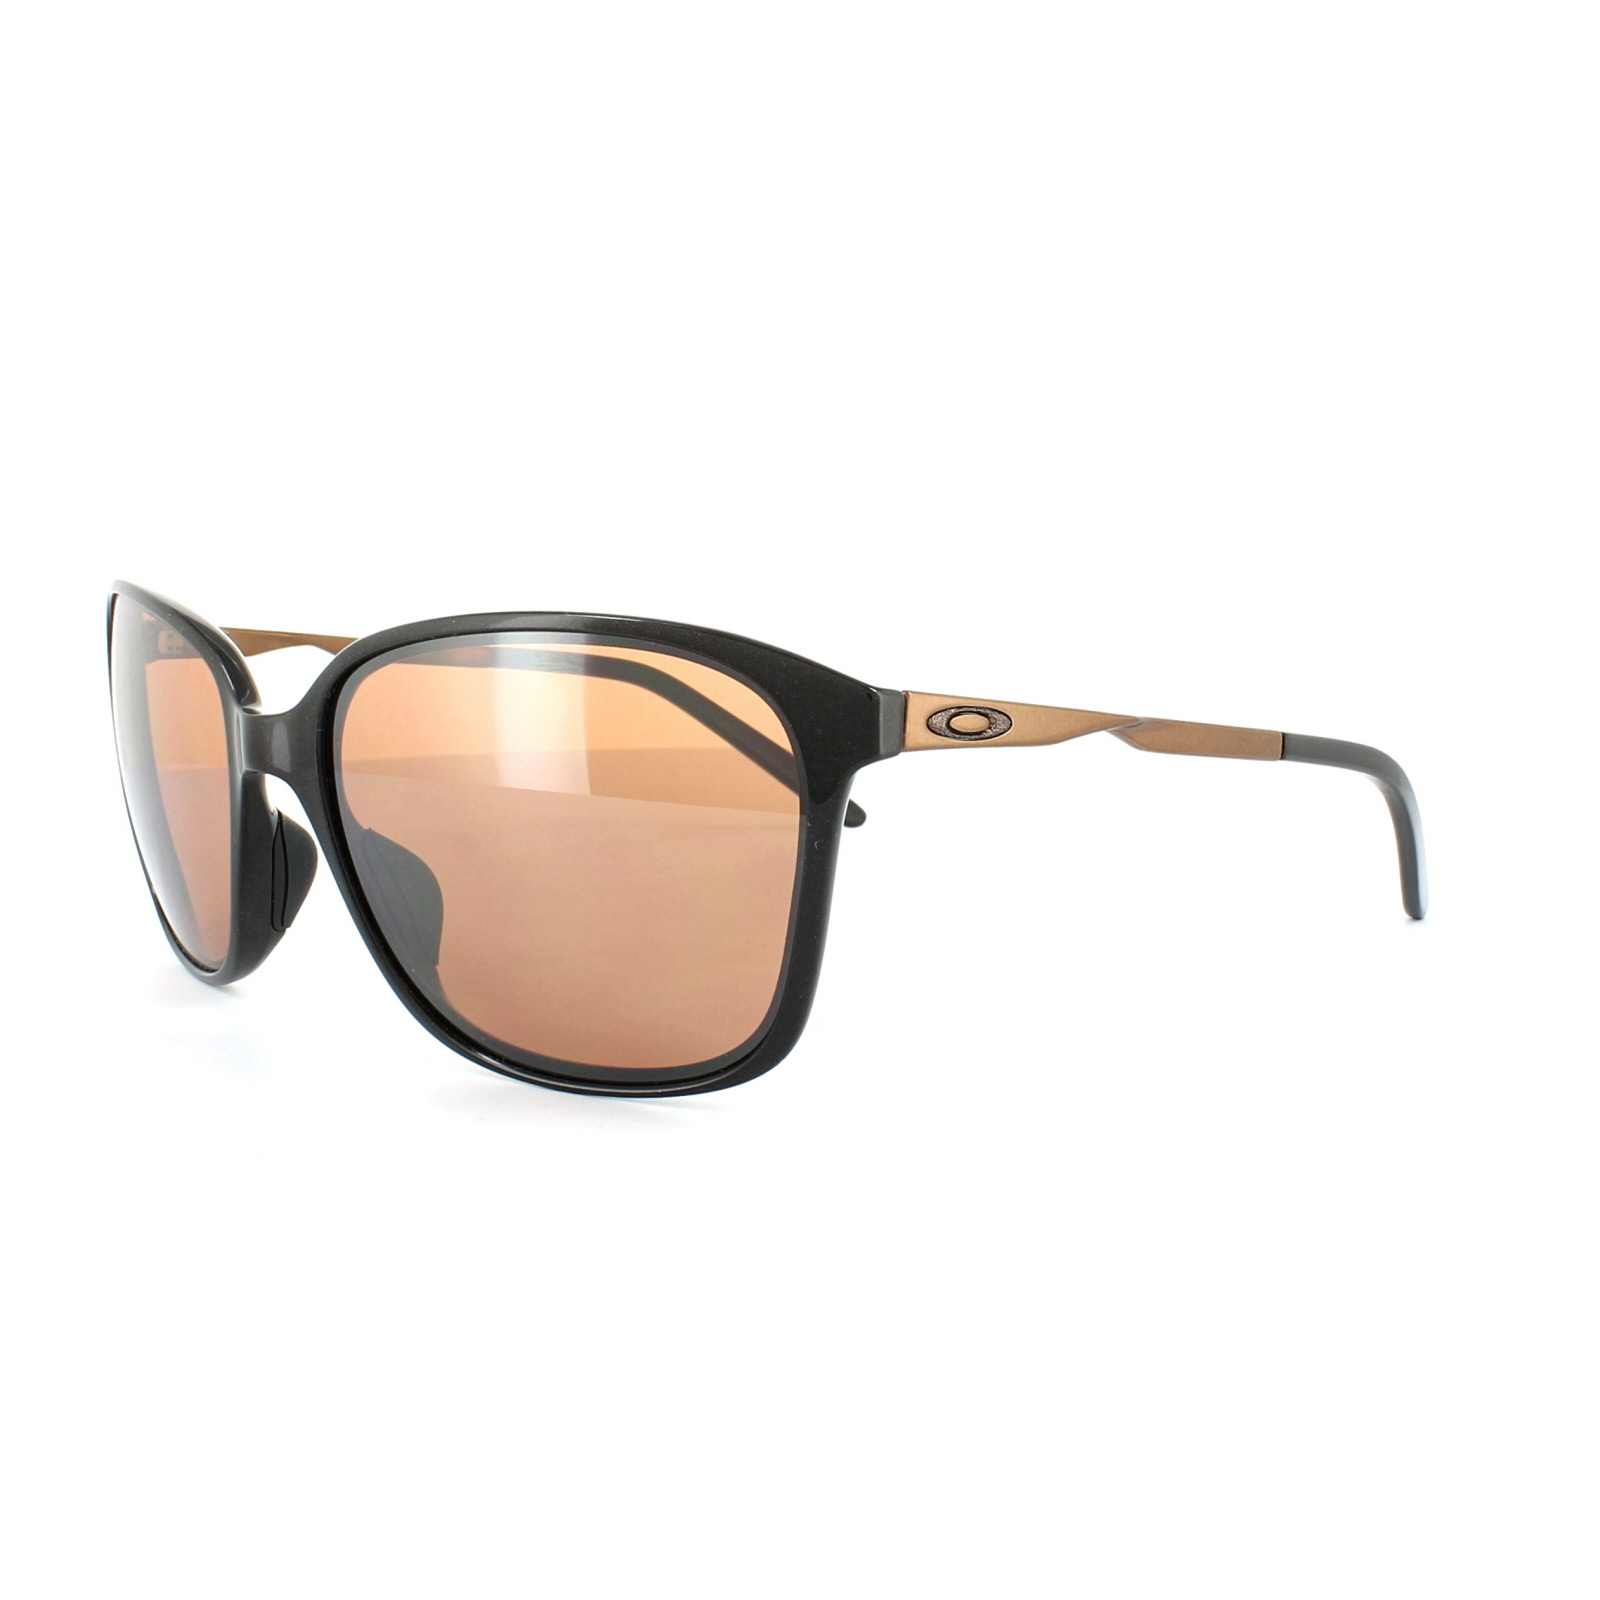 Frame Changers Glasses : Oakley Miss Conduct Brown Sugar Puyallup, Washington